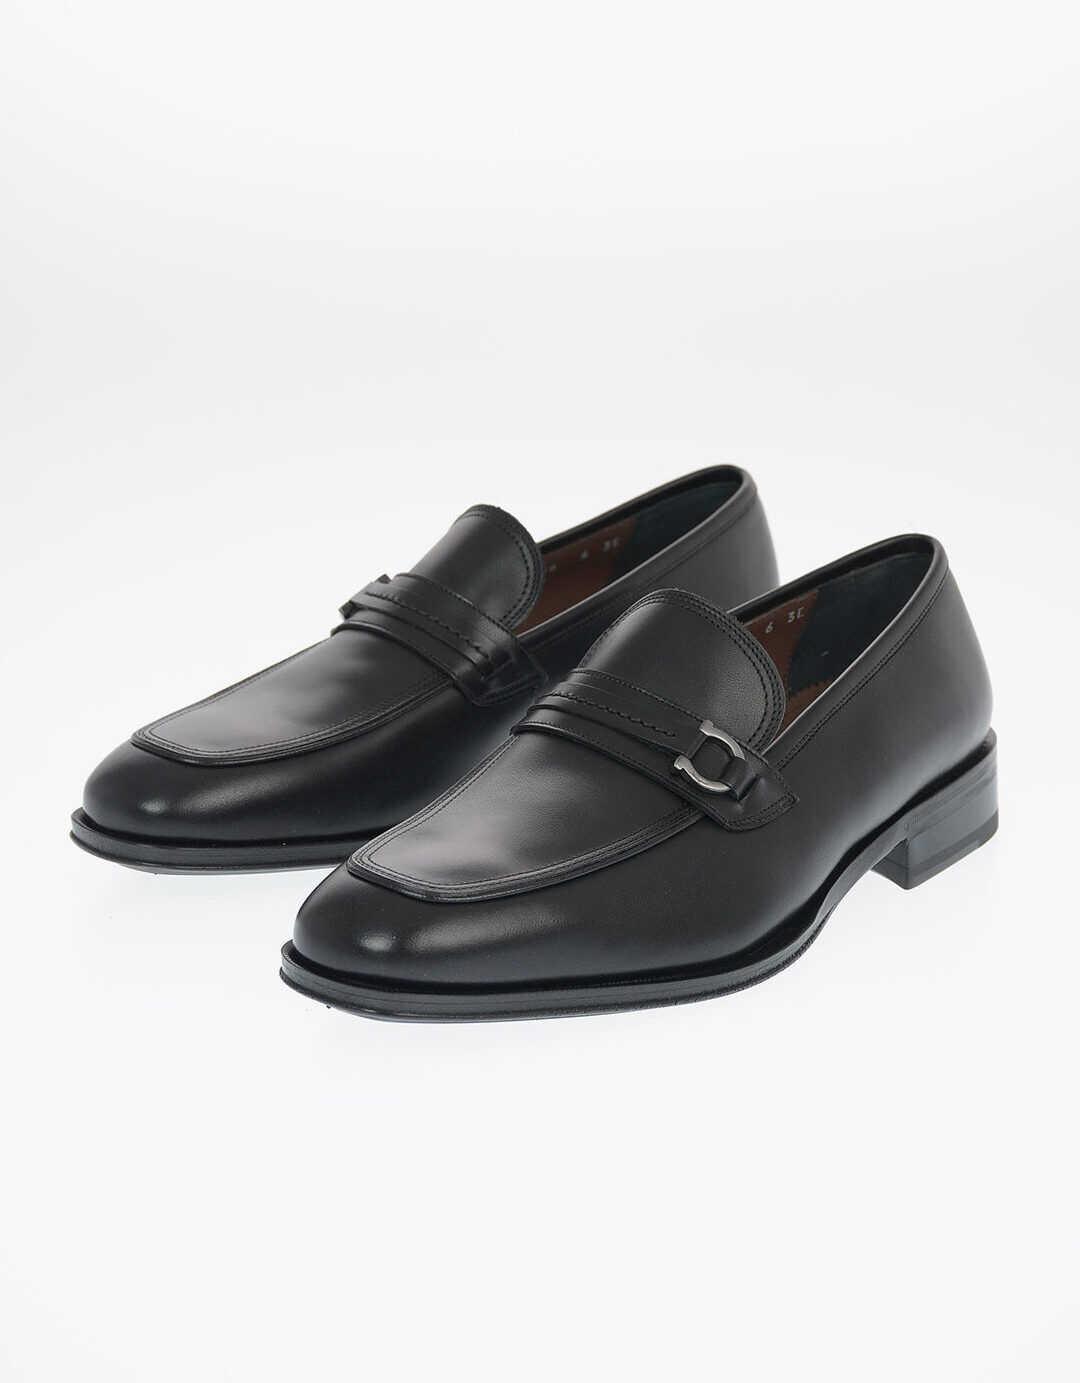 Salvatore Ferragamo Leather ANTONIO Bit Loafers with Horsebit BLACK imagine b-mall.ro